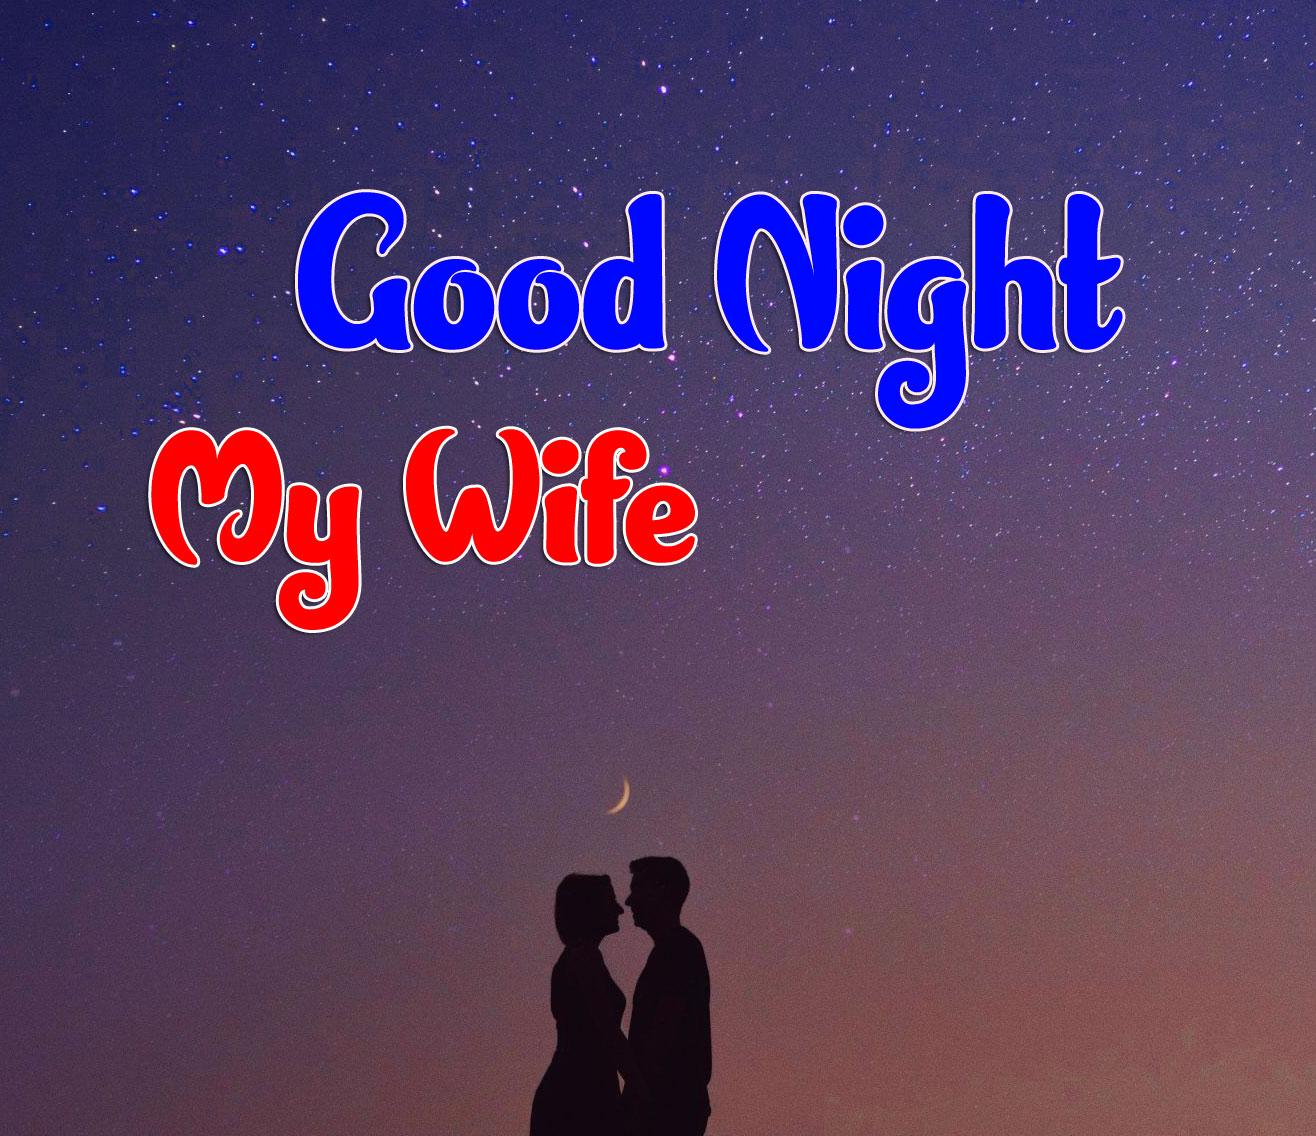 Girlfriend Good Night Wishes Pics New Download